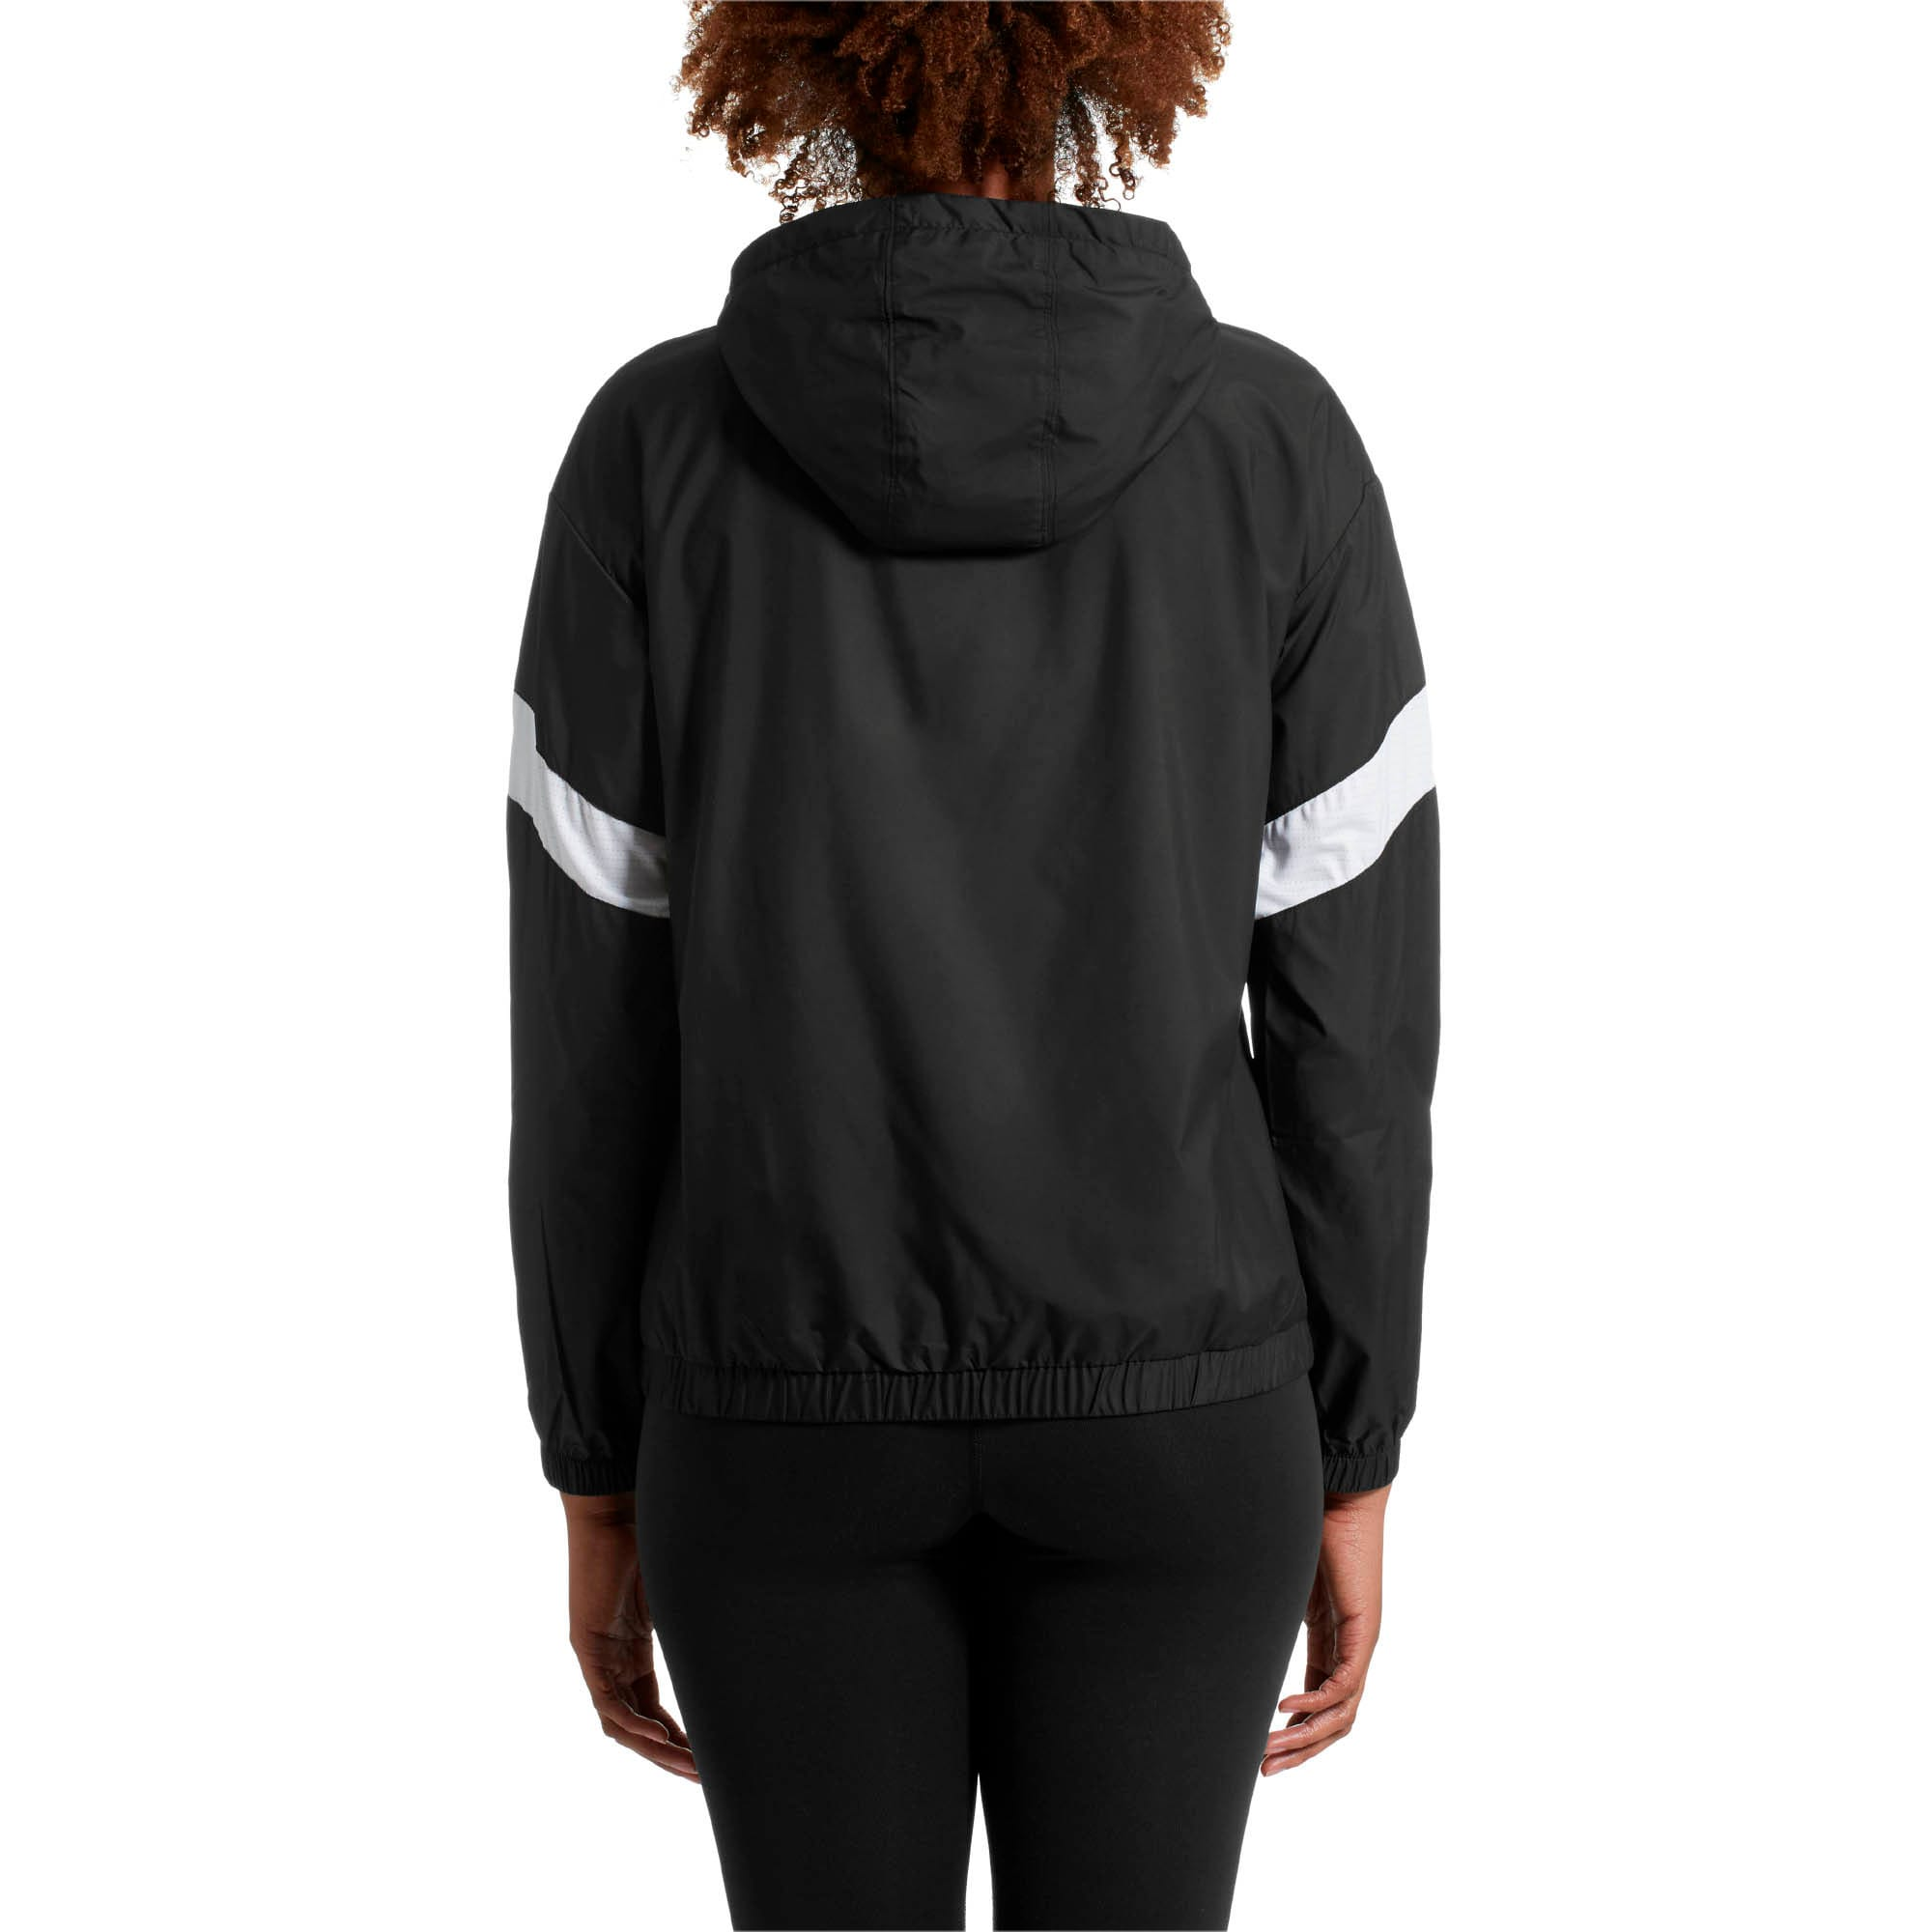 Thumbnail 3 of A.C.E Women's Jacket, Puma Black-Puma White, medium